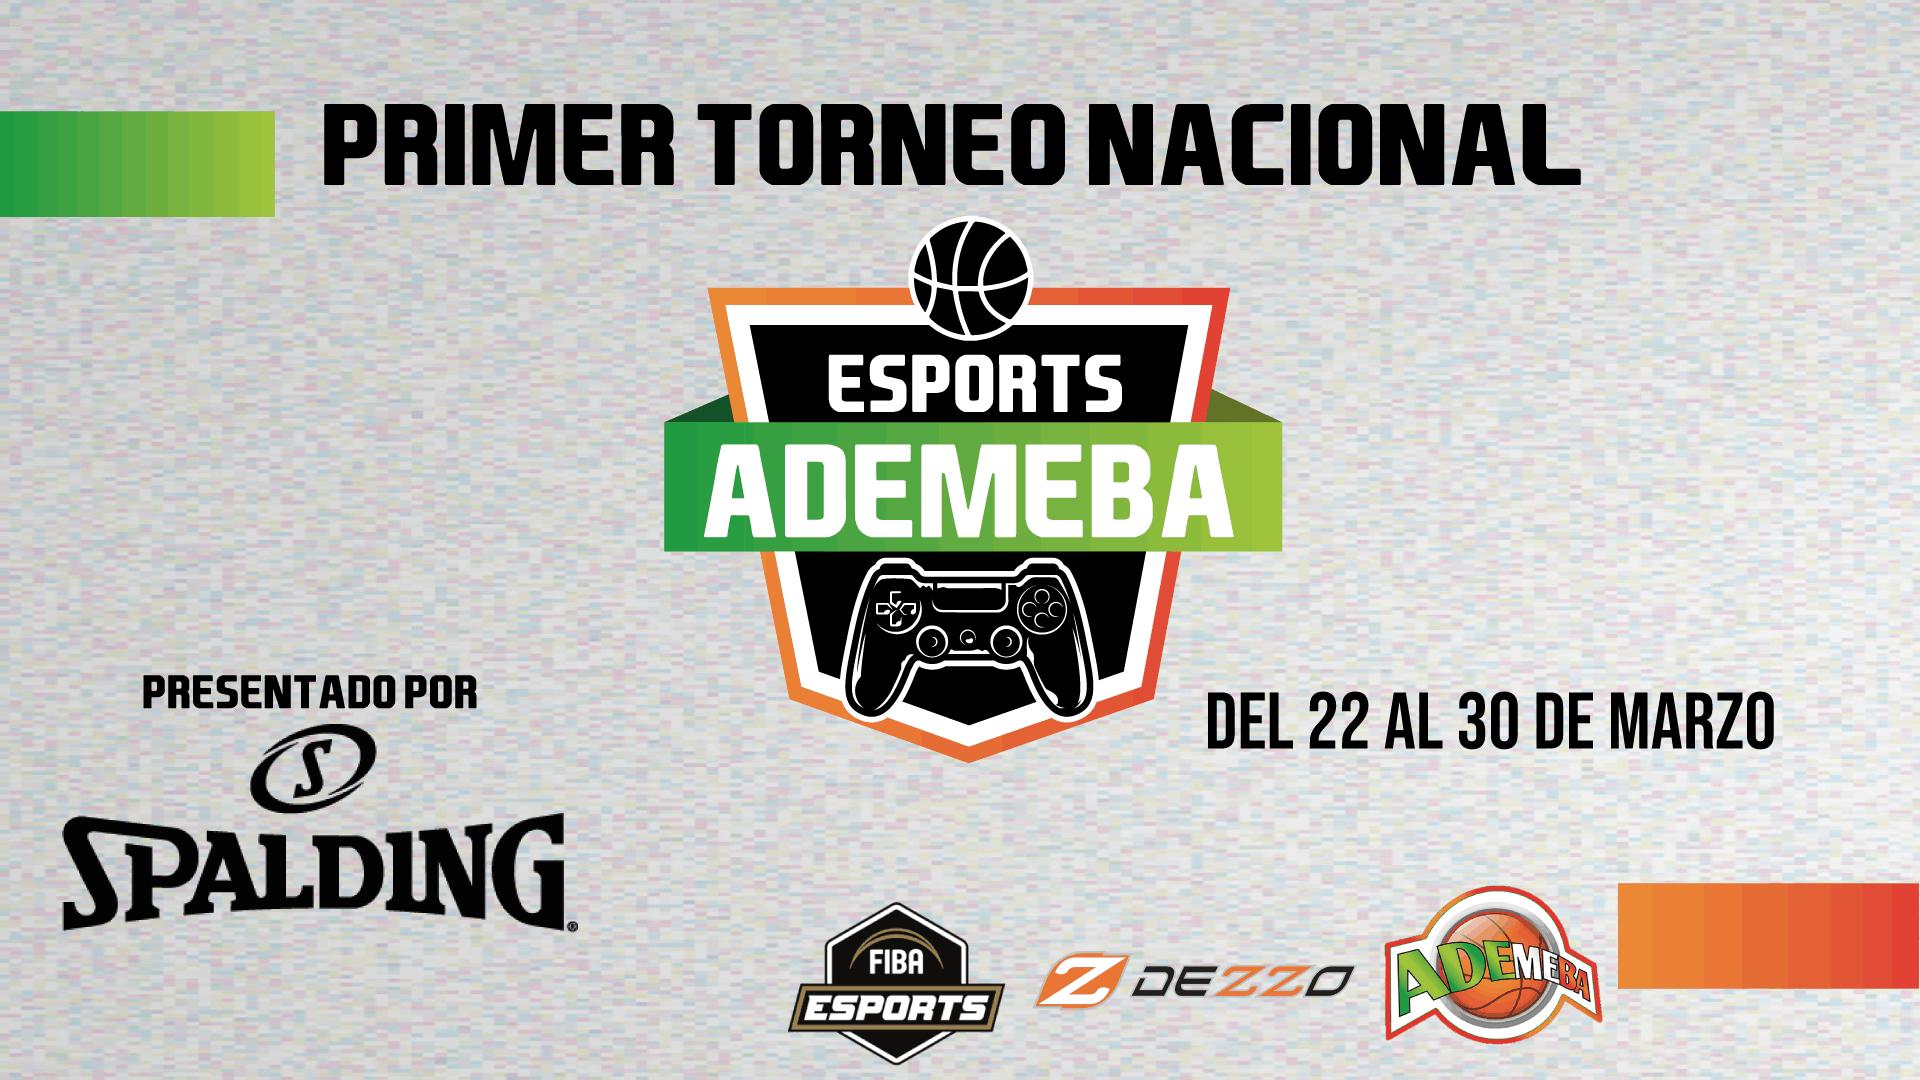 Presentan el torneo Ademeba ESports 2021